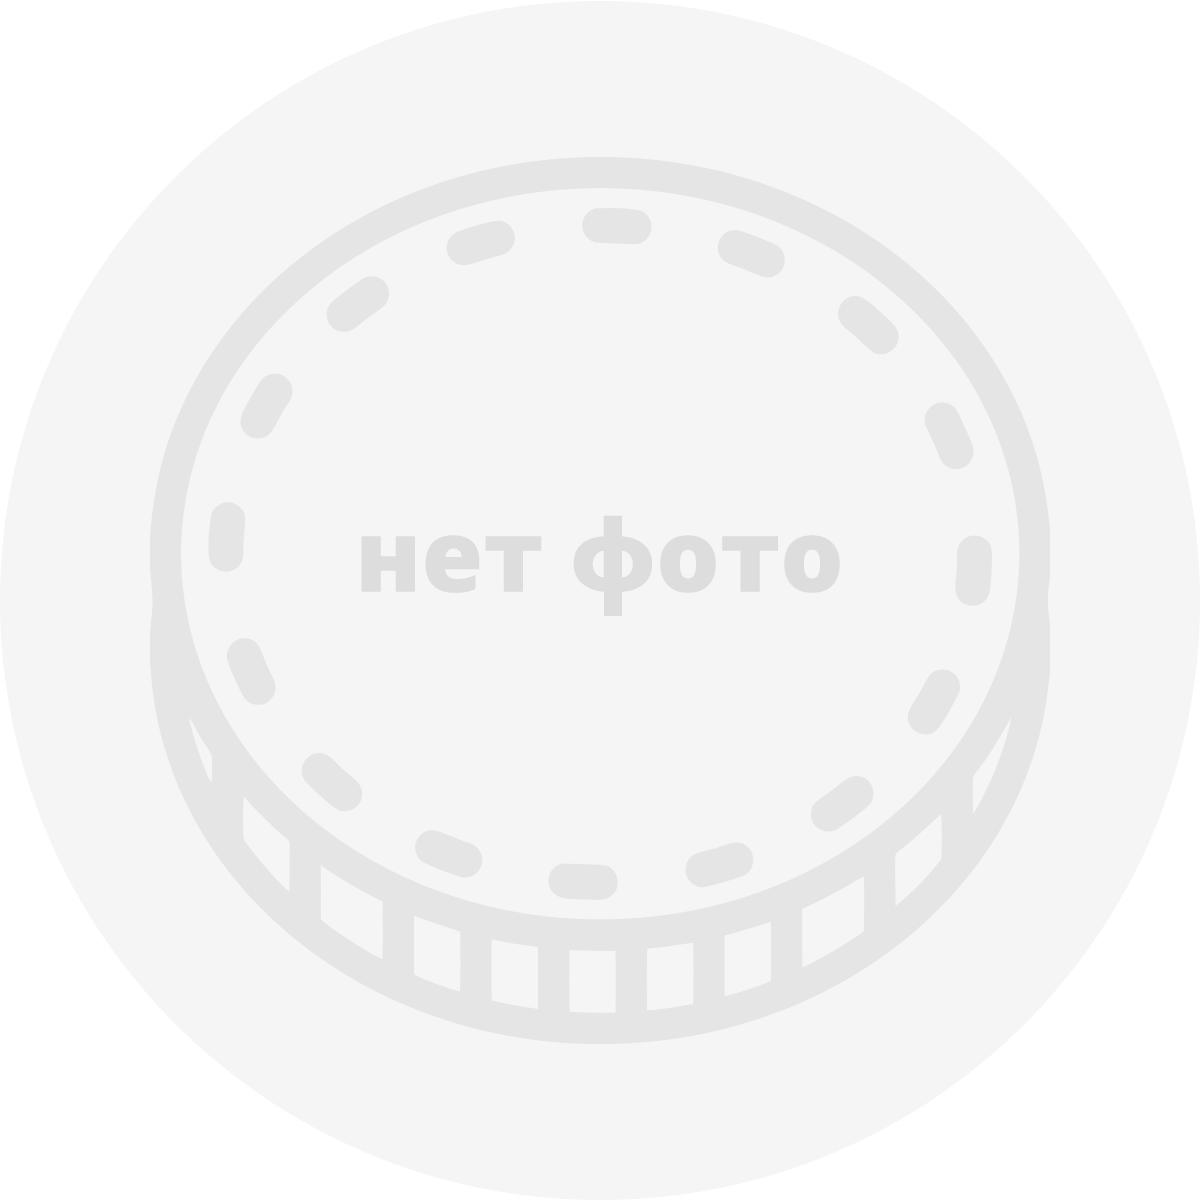 Монеты южного судана каталог сопля шапка